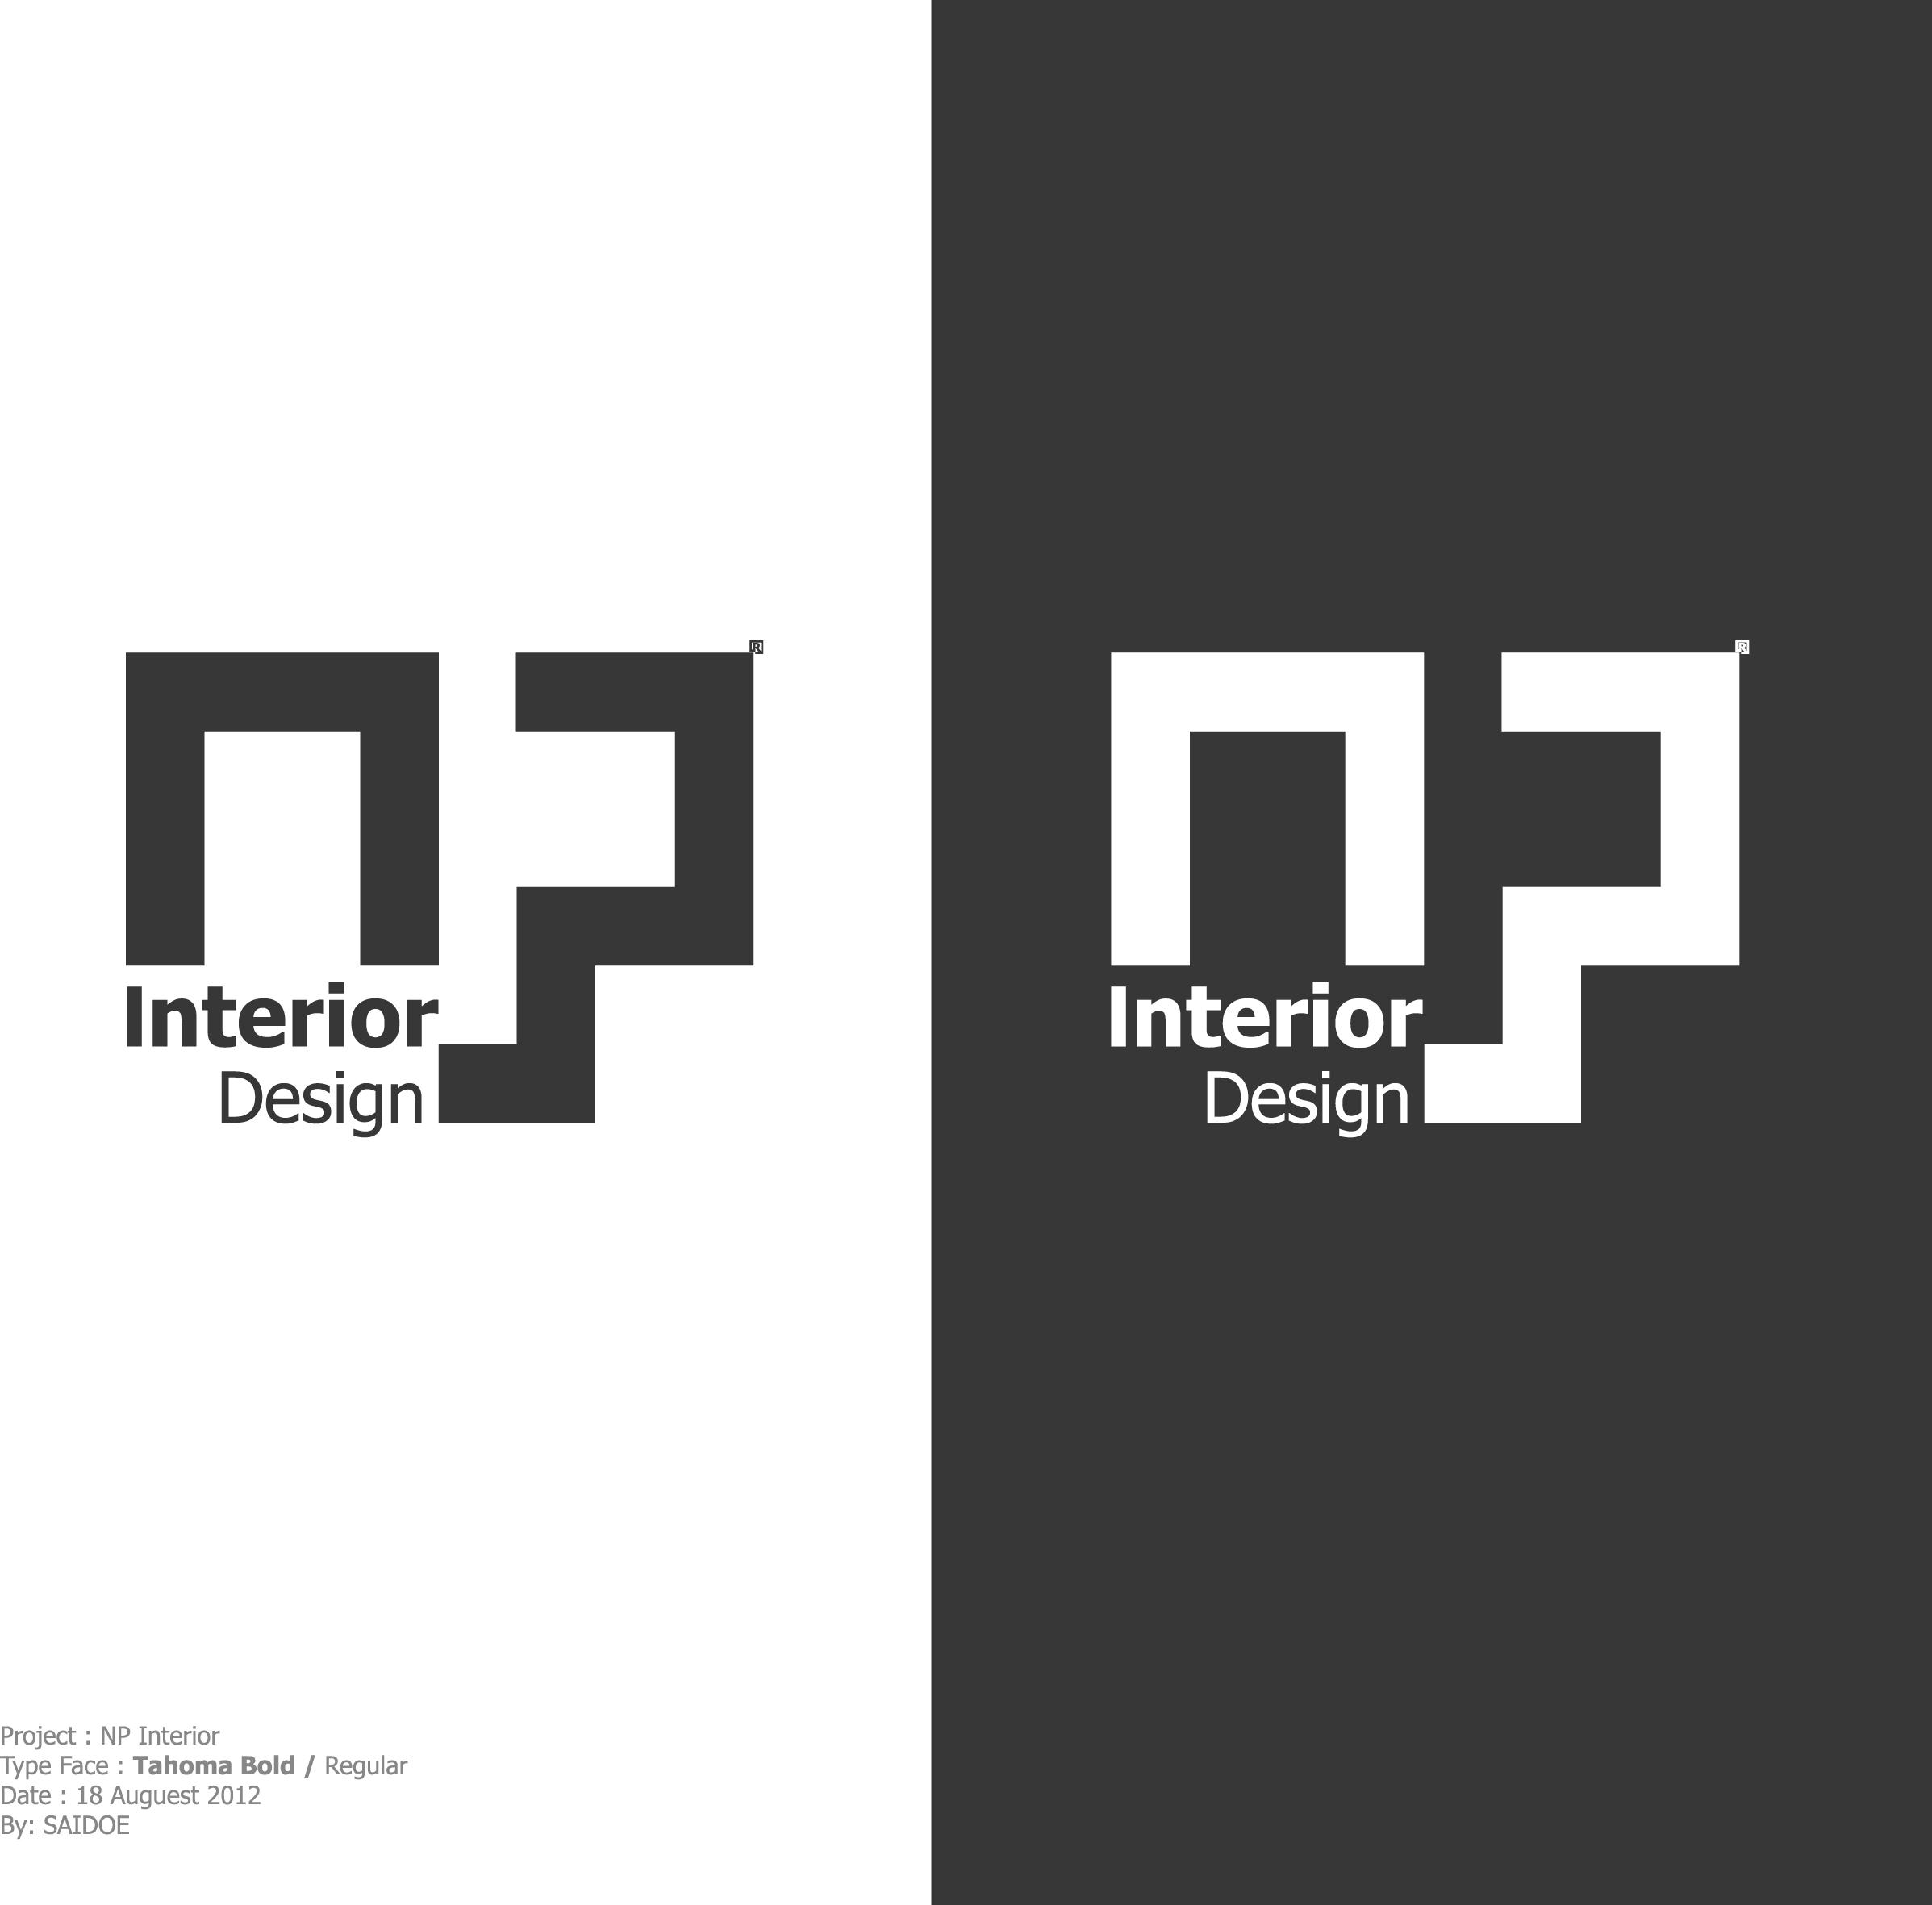 interior designing log pic source